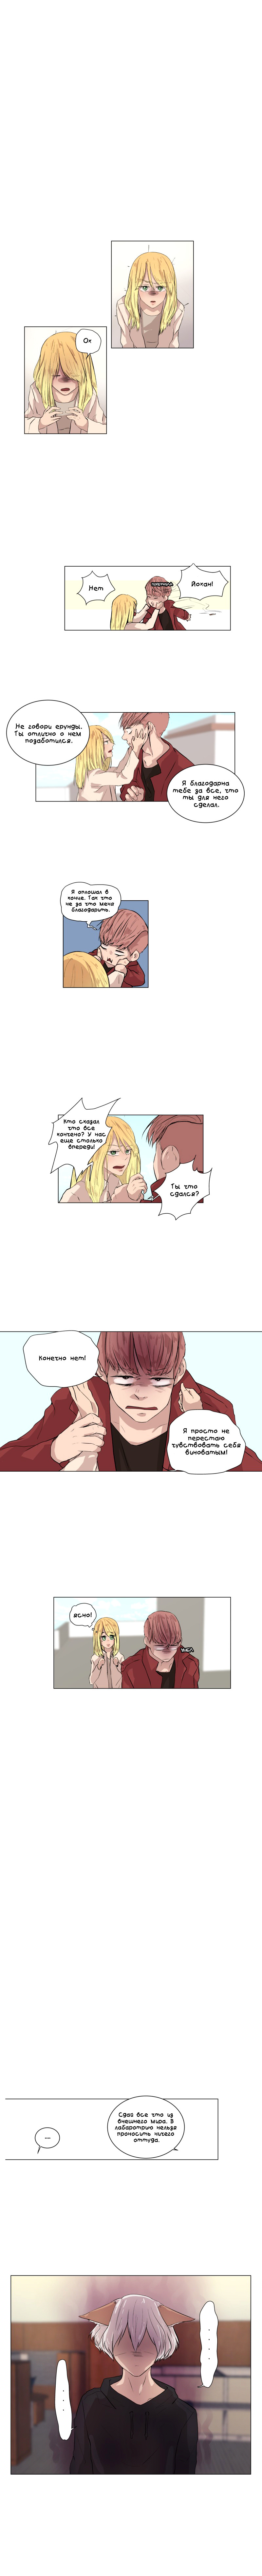 https://r1.ninemanga.com/comics/pic2/58/31802/332792/150401621117.jpg Page 2